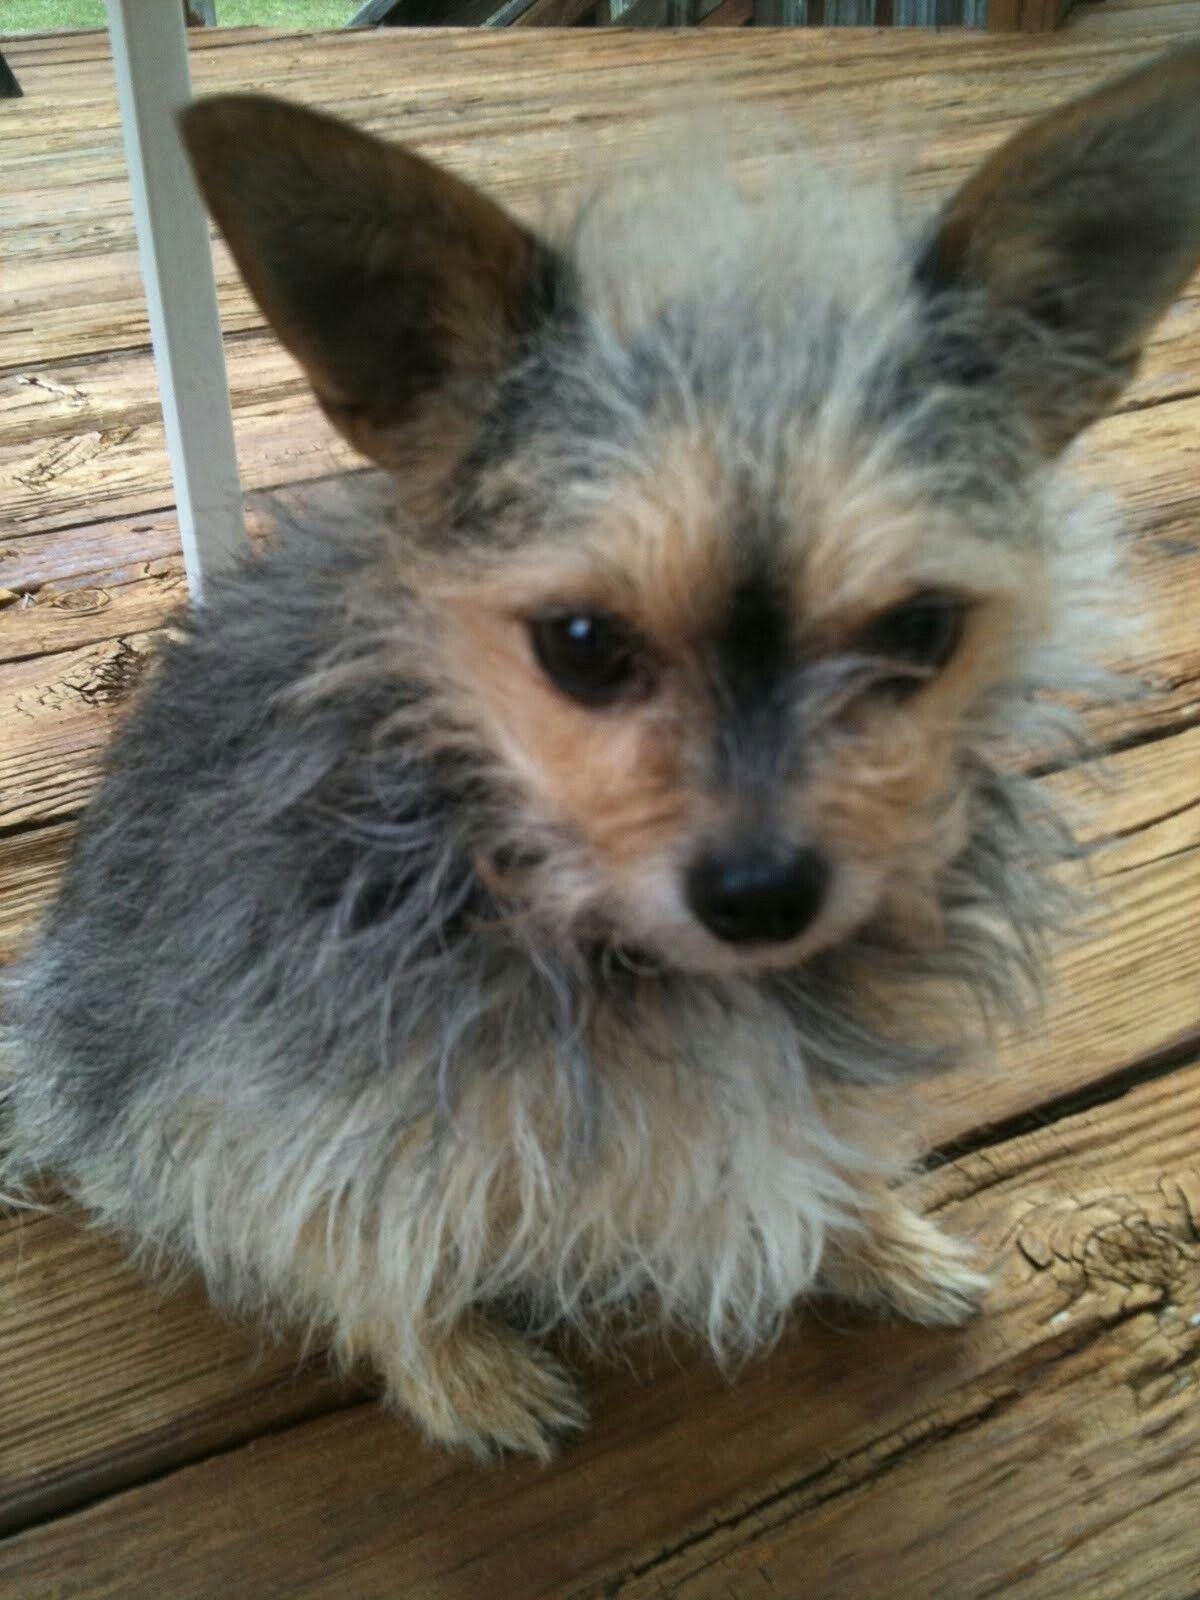 Pin By Kathy Pfeffer On Chorkies Yorkie Puppy Yorkie Cute Puppy Breeds